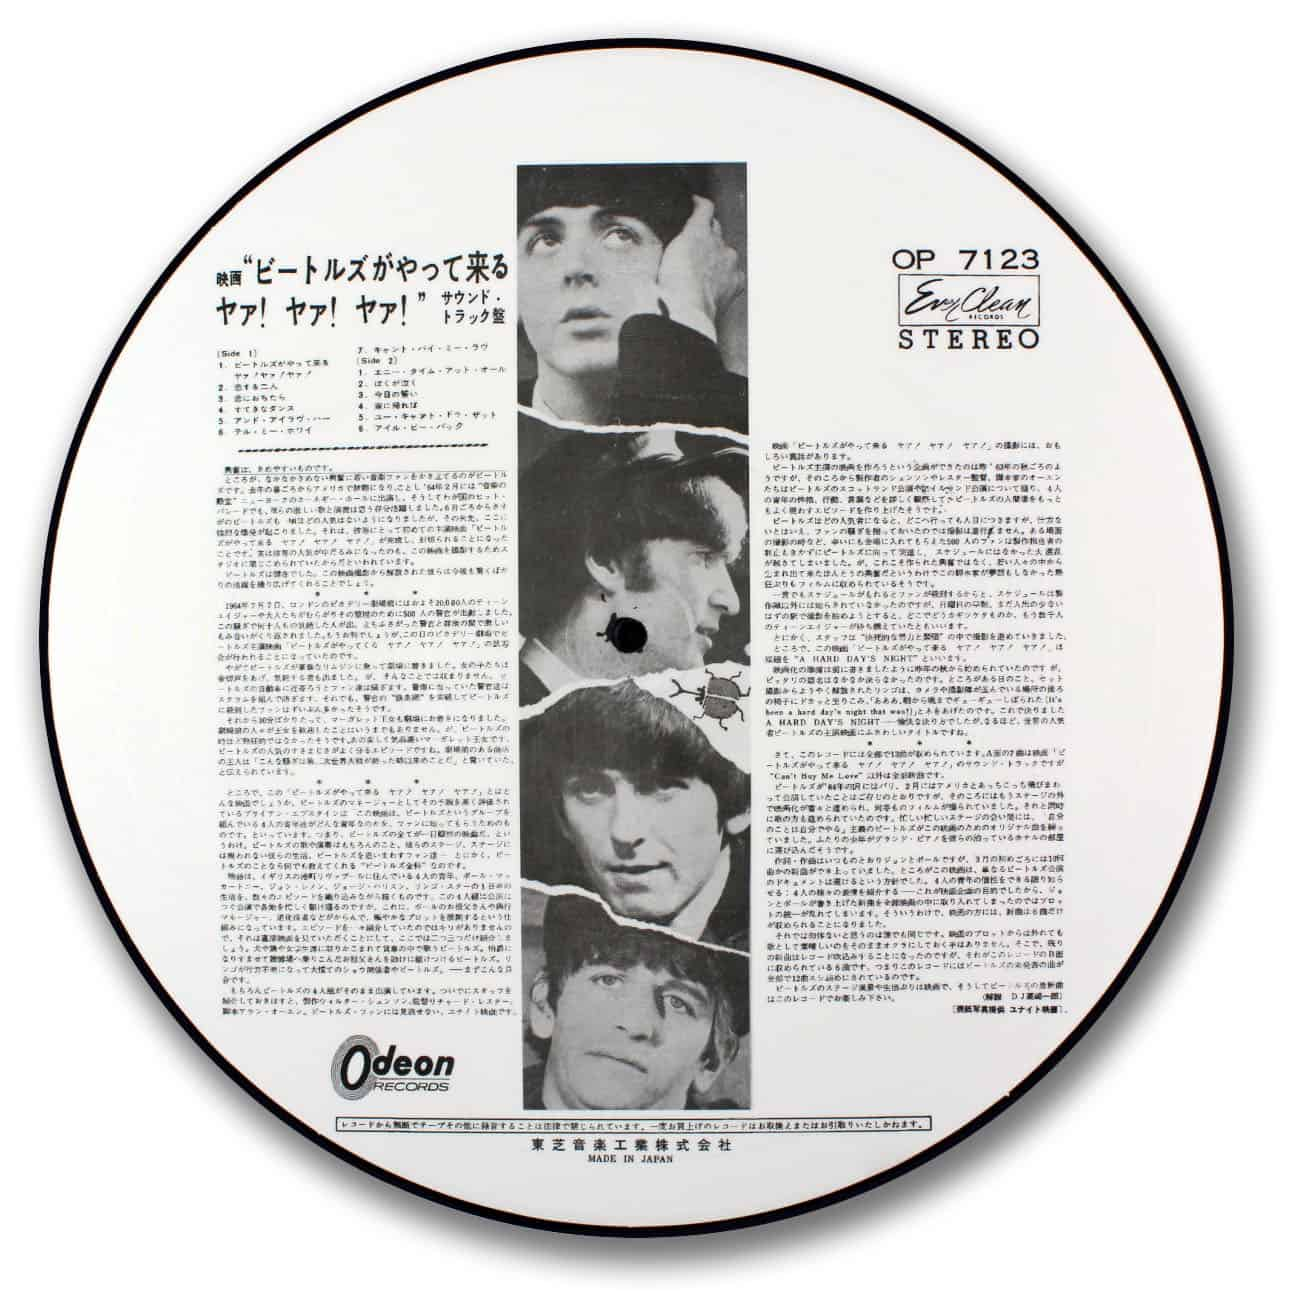 The Beatles, A Hard Days Night